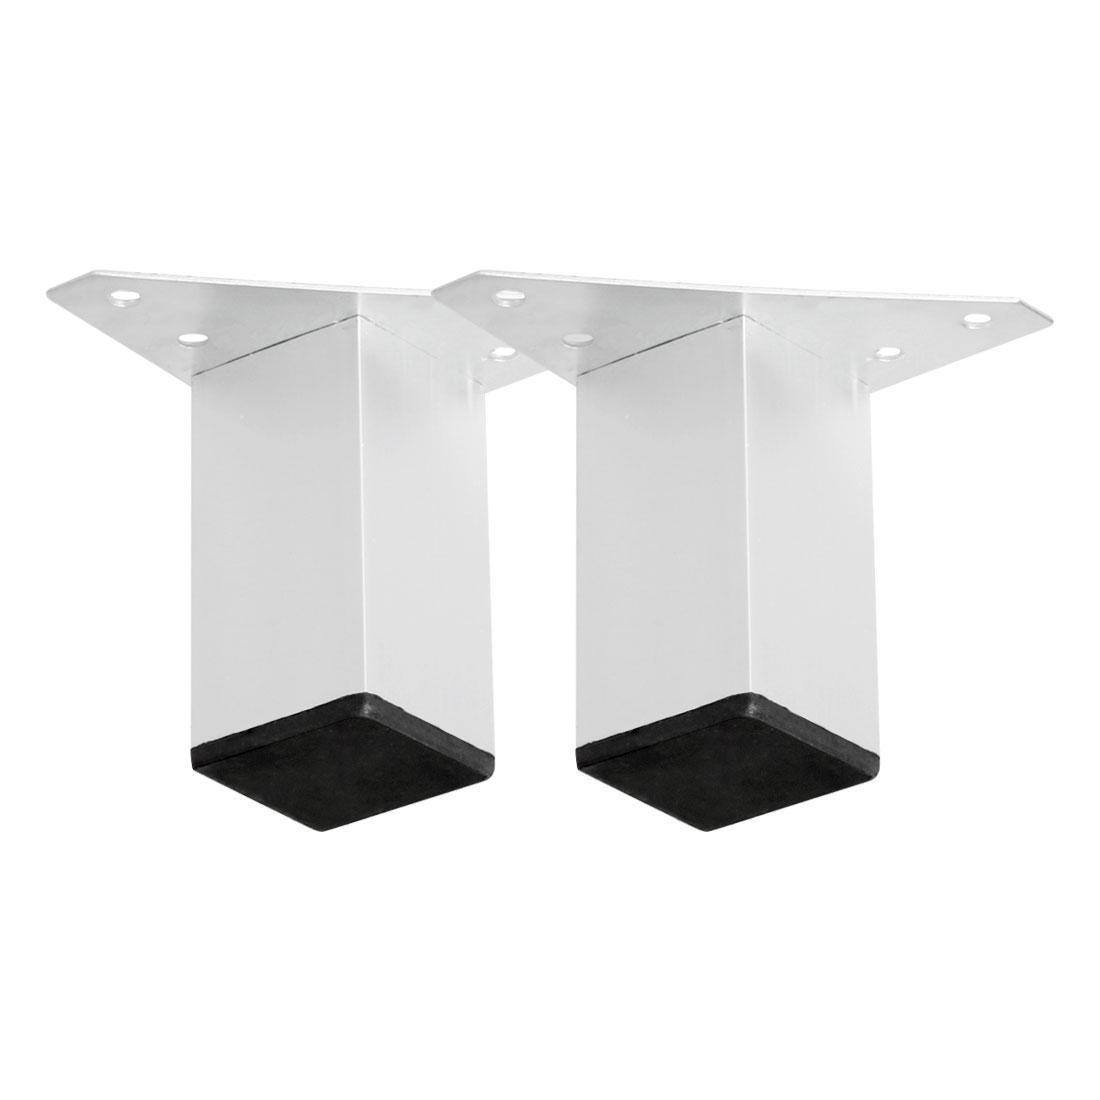 "3"" Furniture Legs Aluminium Alloy Sofa Feet Replacement Height Adjuster 2pcs"